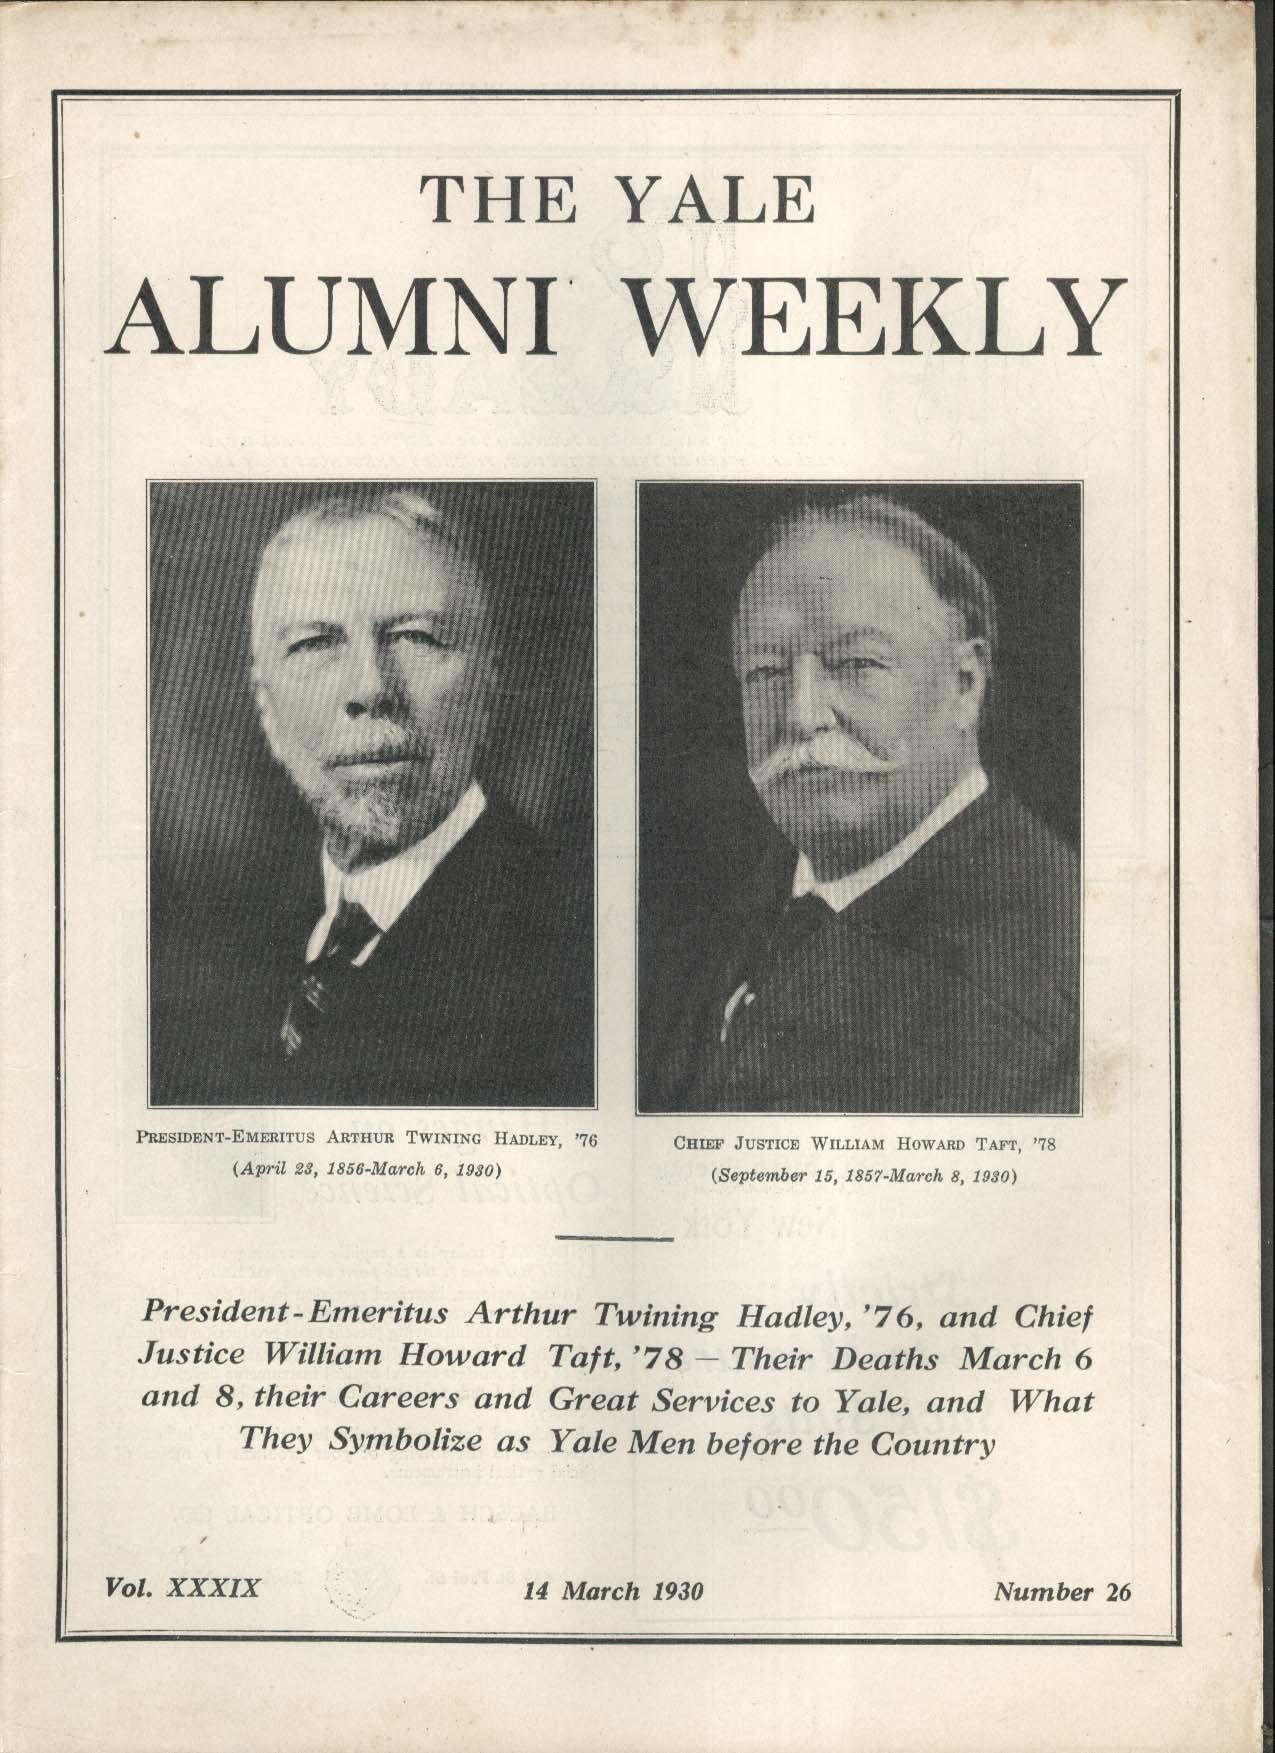 YALE ALUMNI WEEKLY Arthur Twining Hadley William Howard Taft deaths 3/14 1930